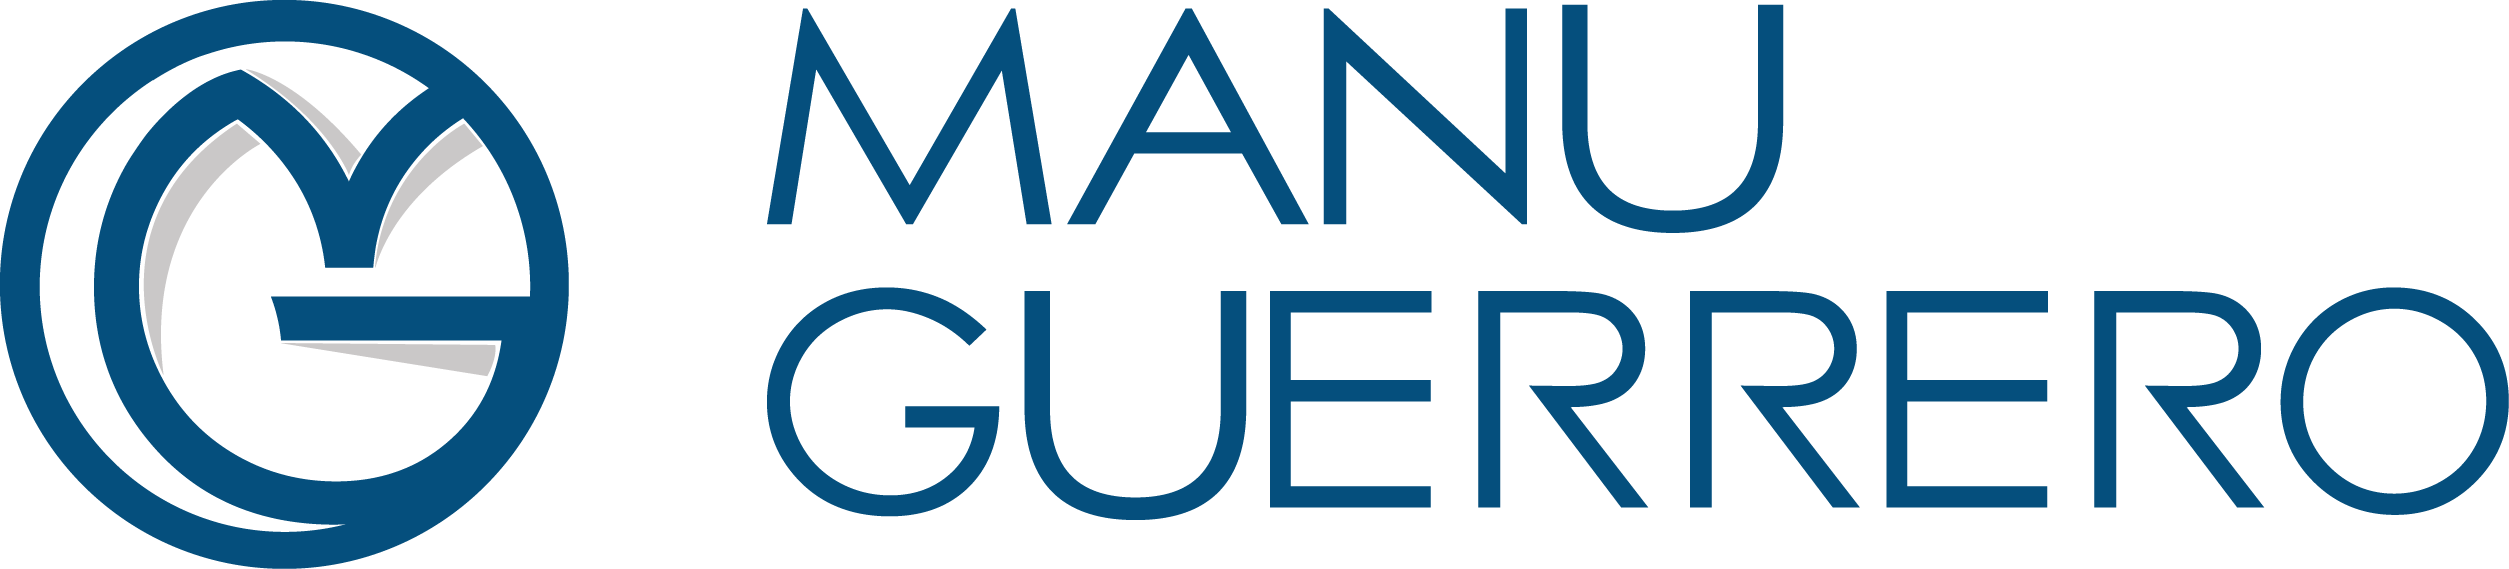 Manu Guerrero